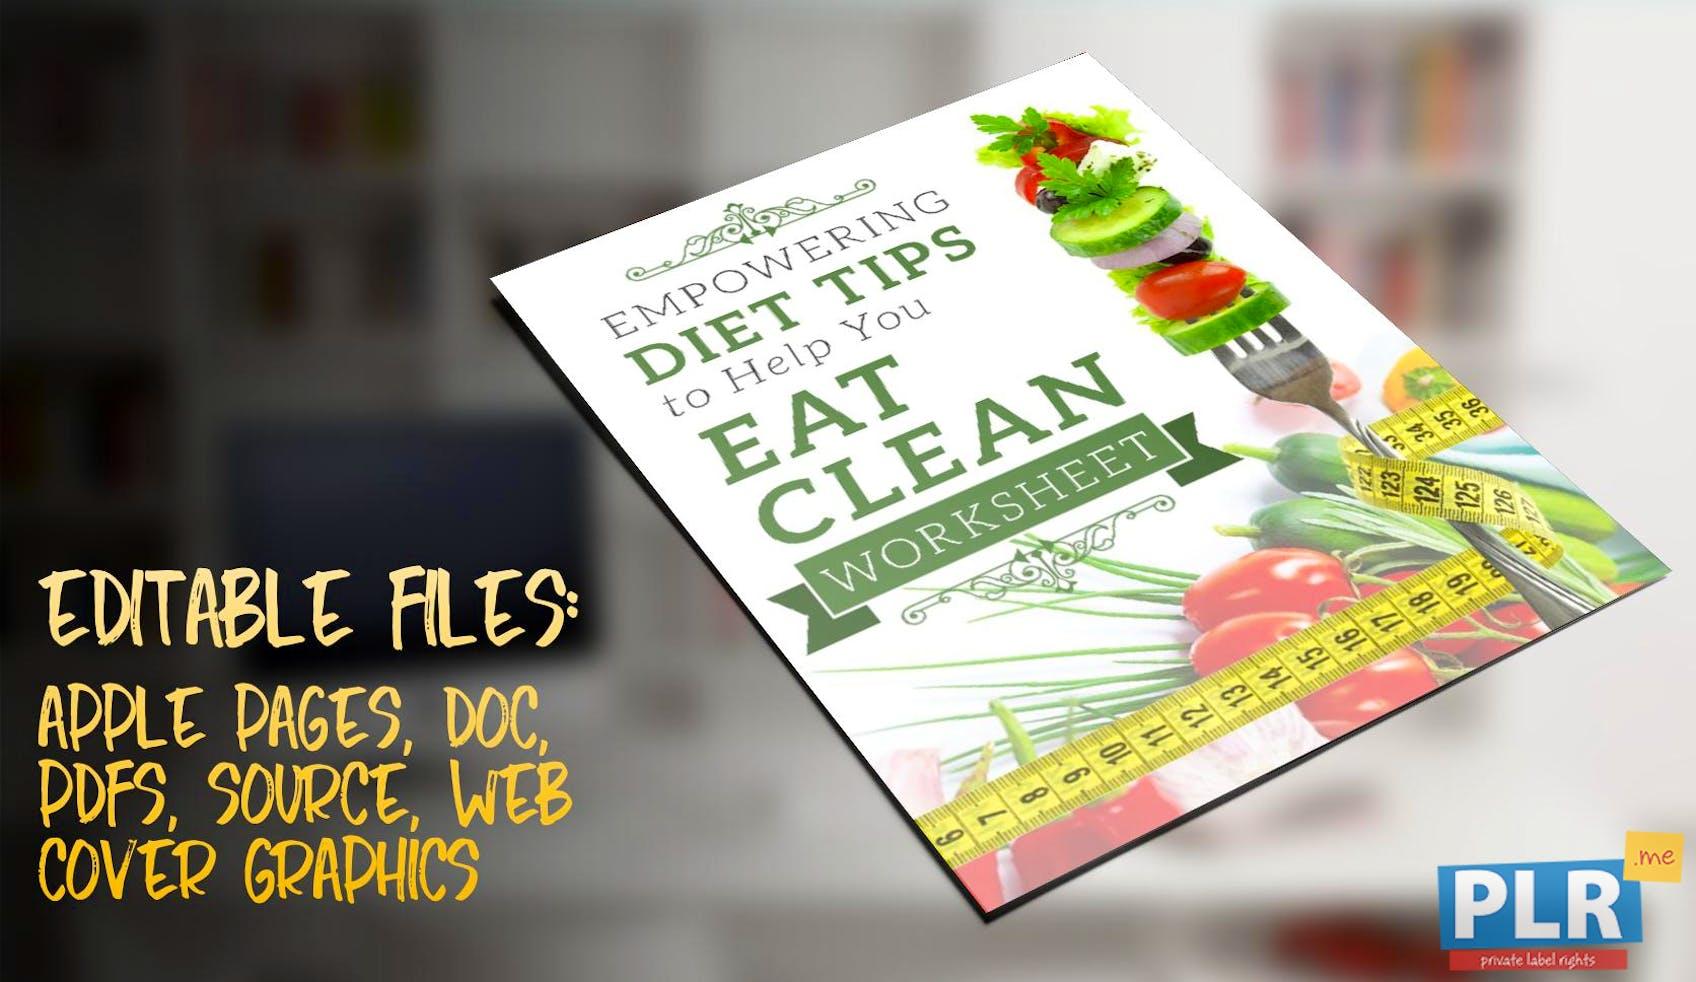 Empowering Diet Tips To Help You Eat Clean Worksheet